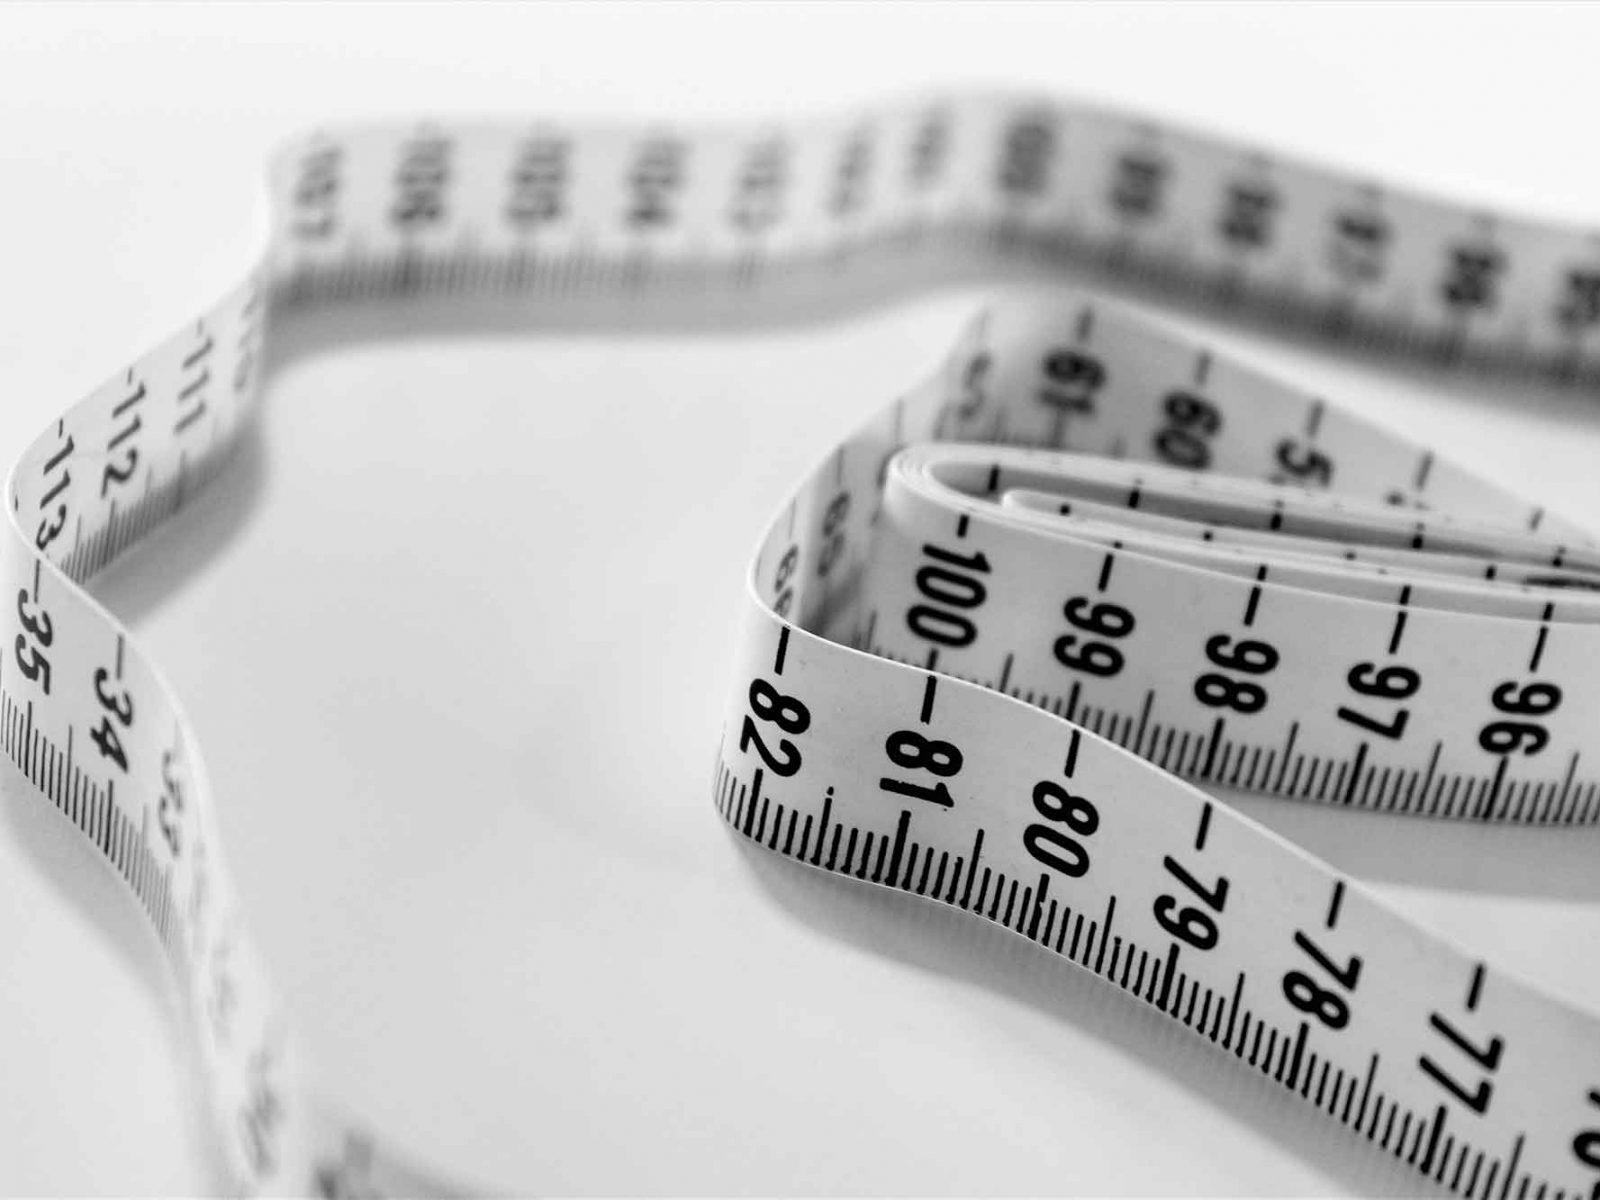 Made-to-measure-measuring-tape.jpg